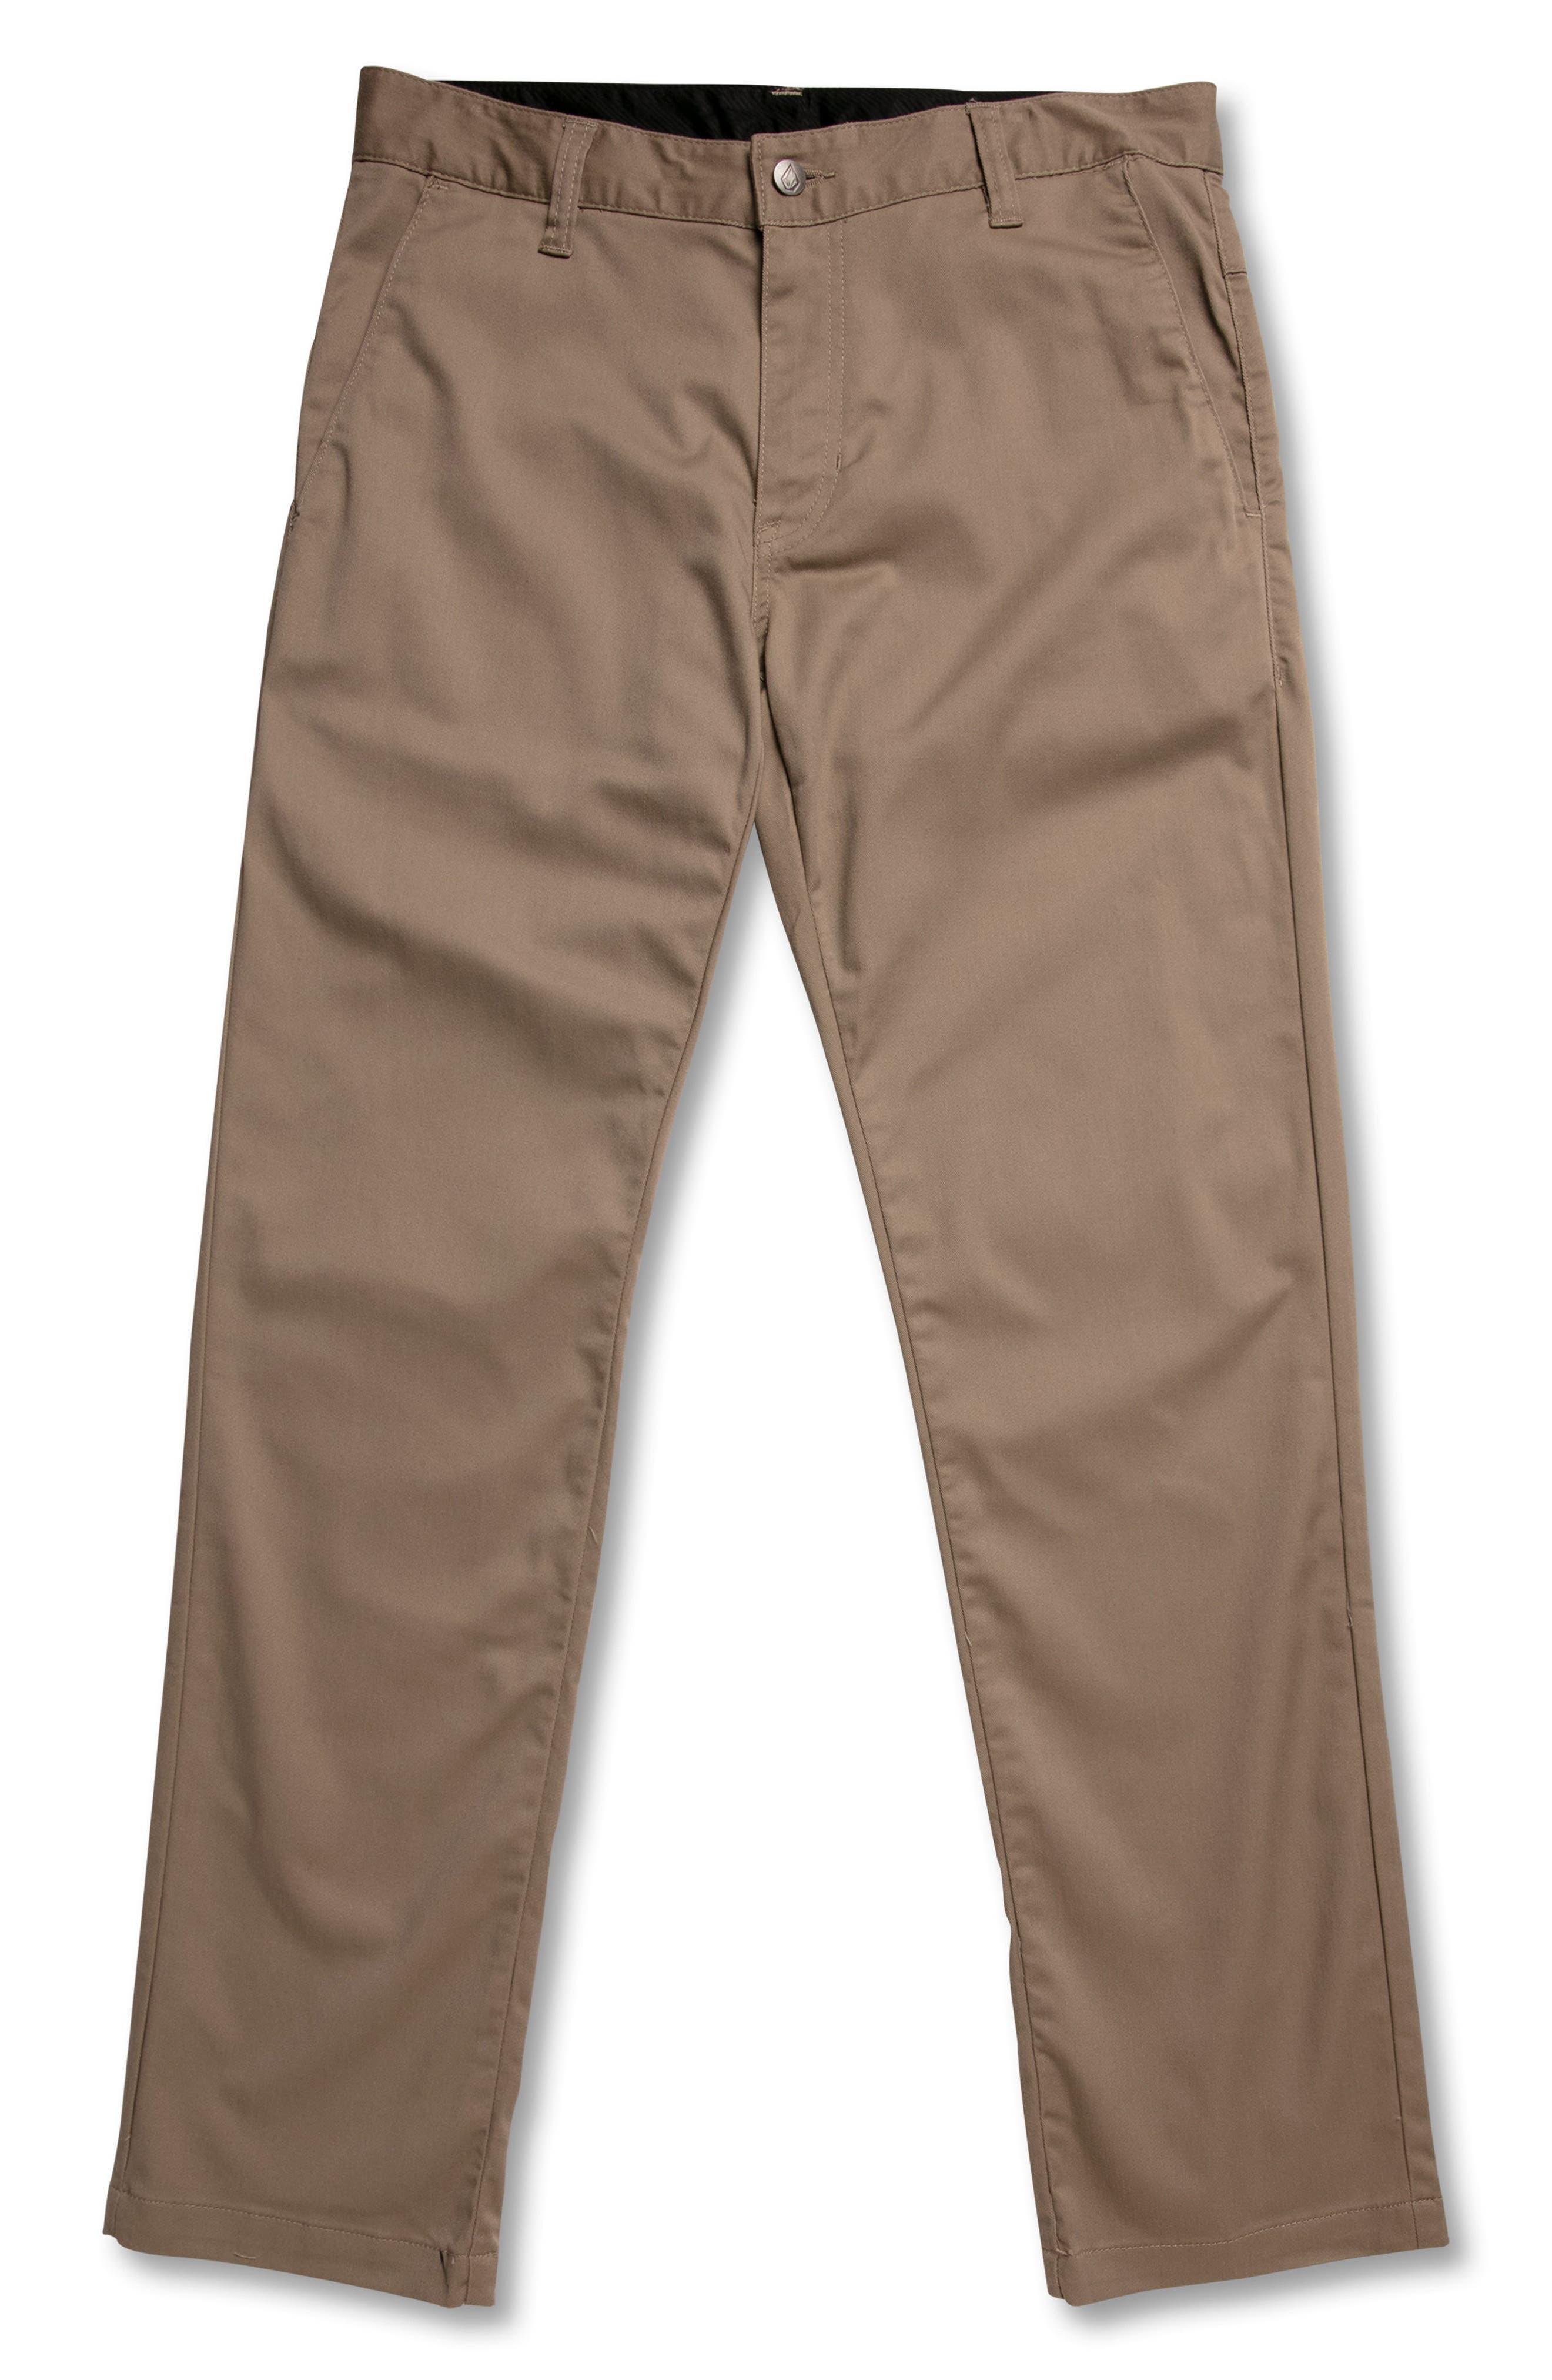 Image of Volcom Monty Slim Fit Pants